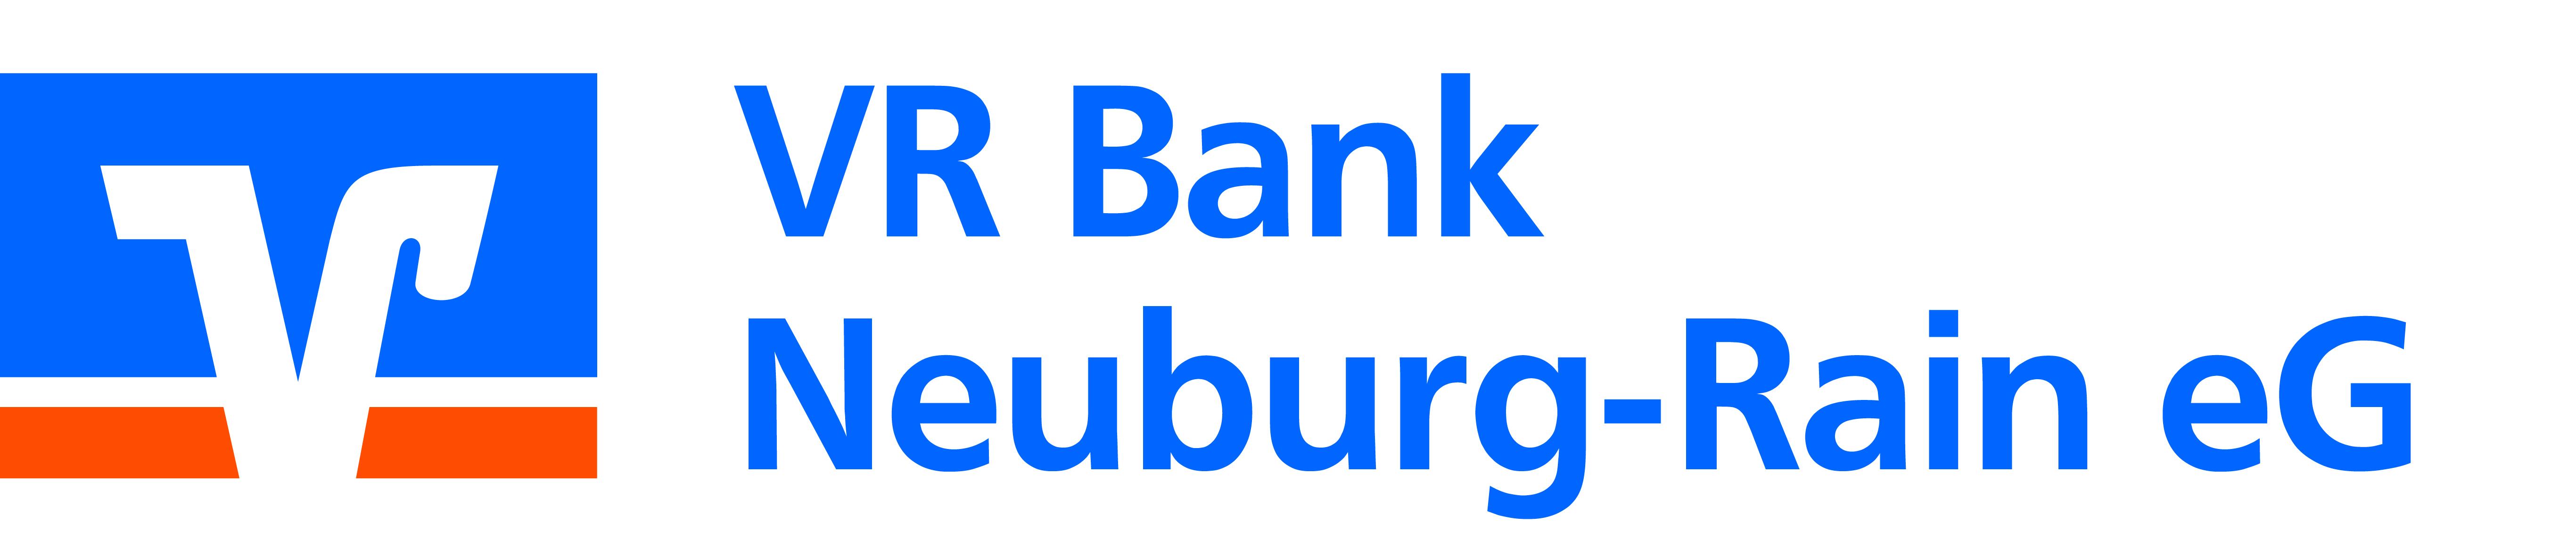 VR Bank Neuburg-Rain eG, Geschäftsstelle Holzheim Holzheim